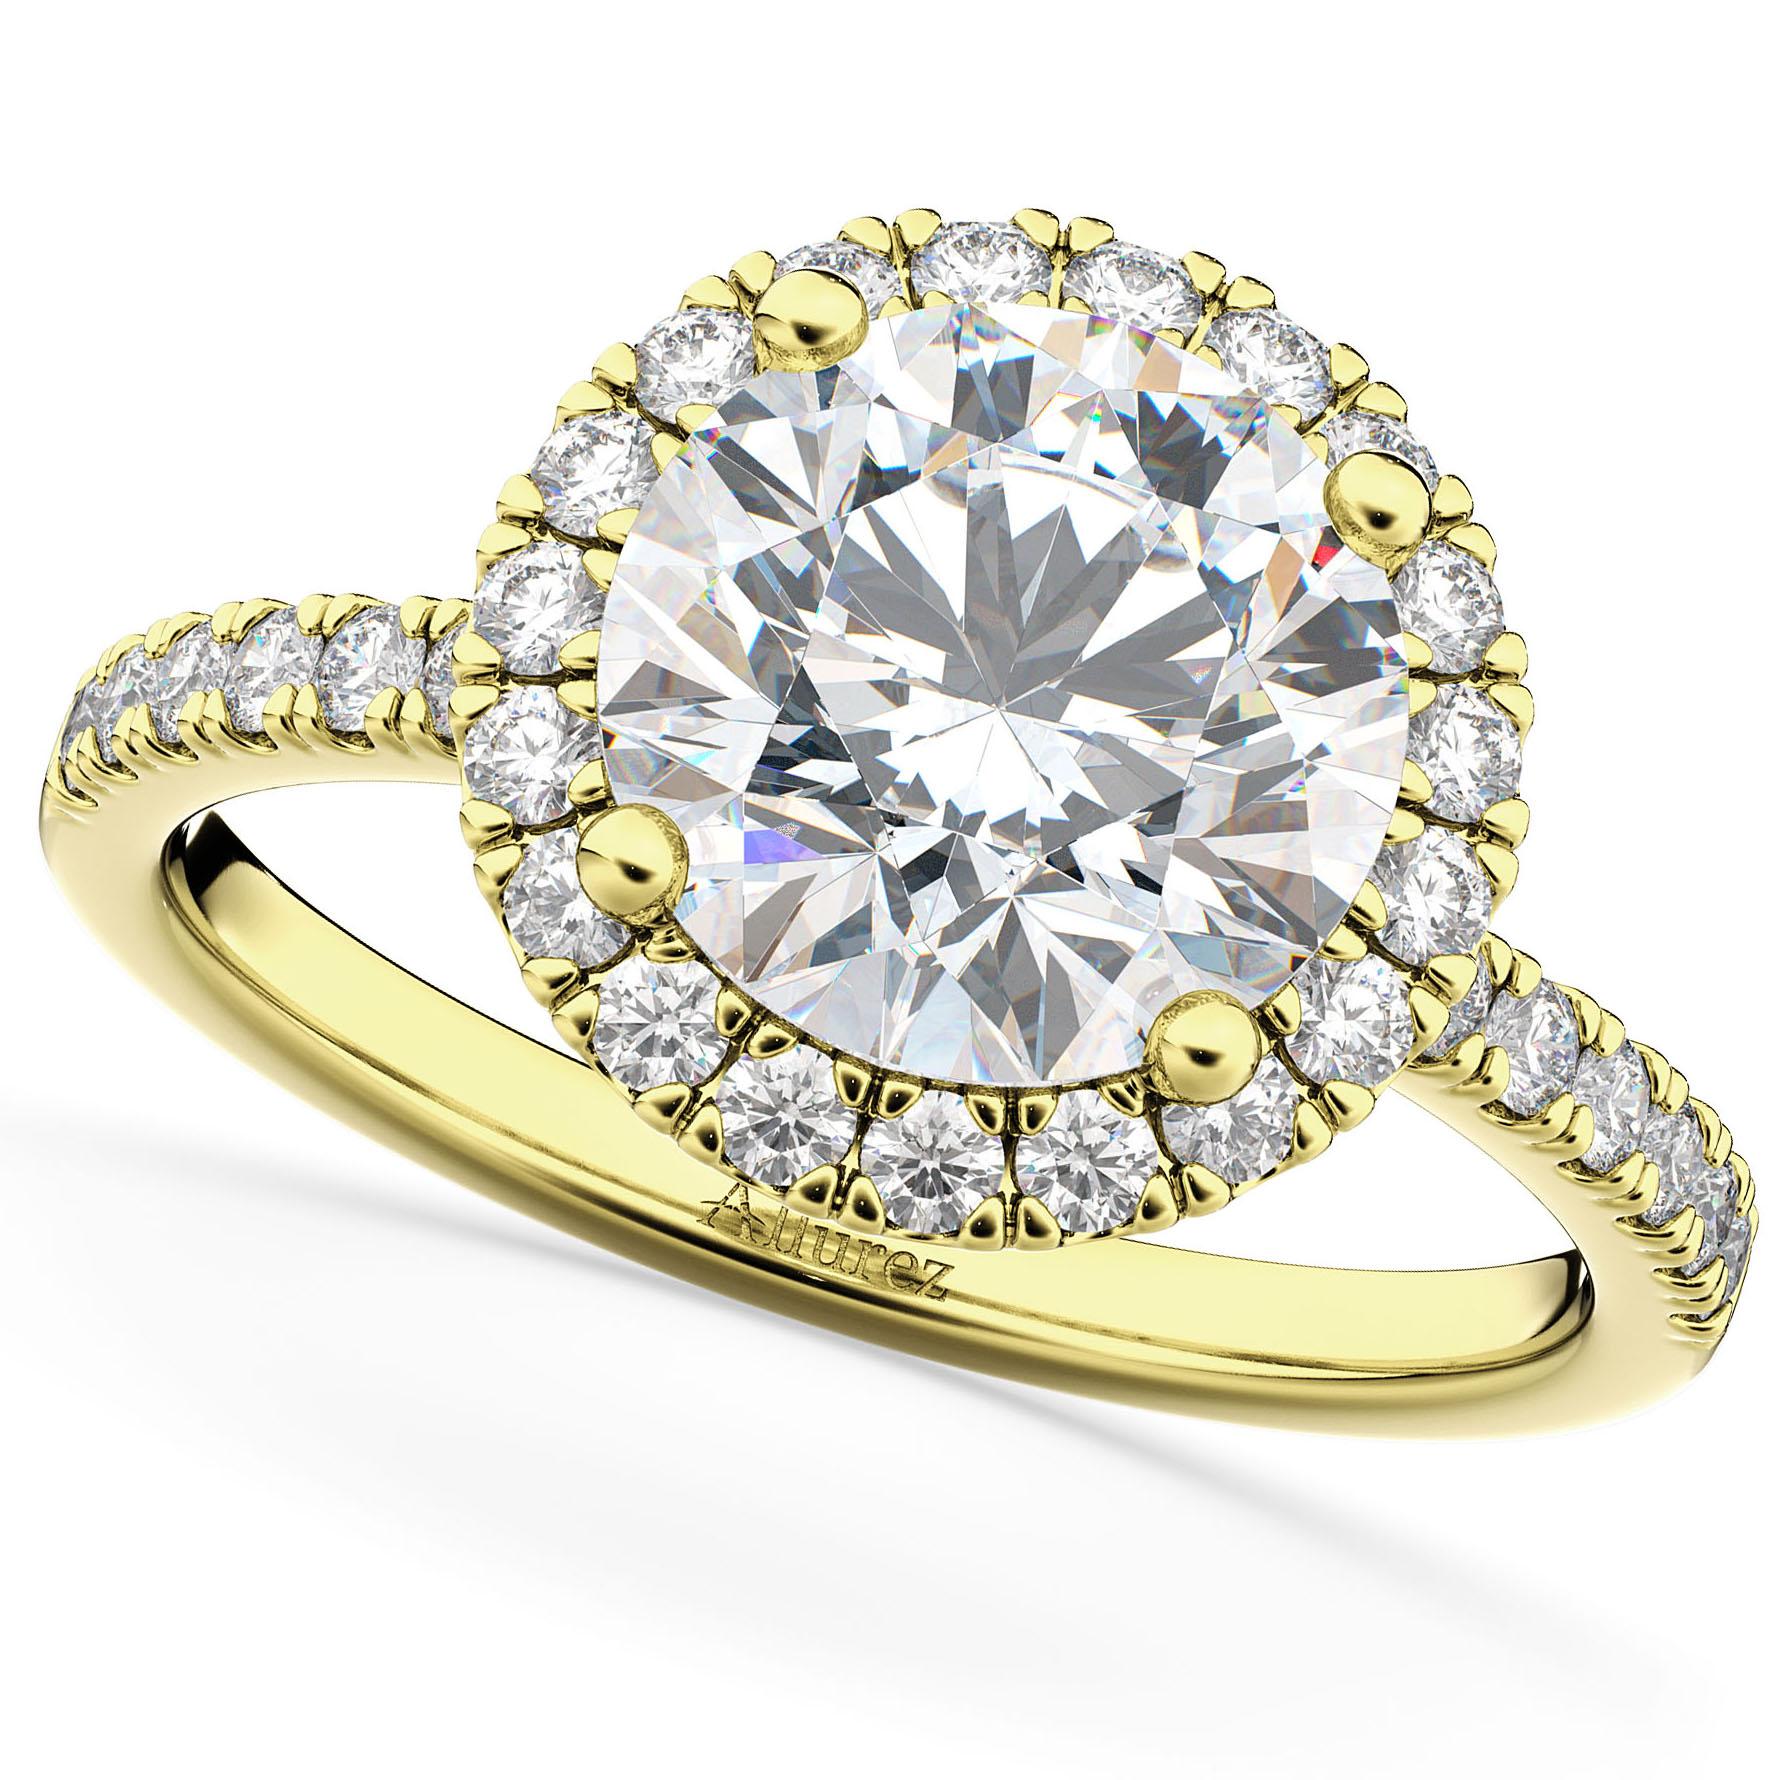 Halo Moissanite & Diamond Engagement Ring 18K Yellow Gold 2.10ct